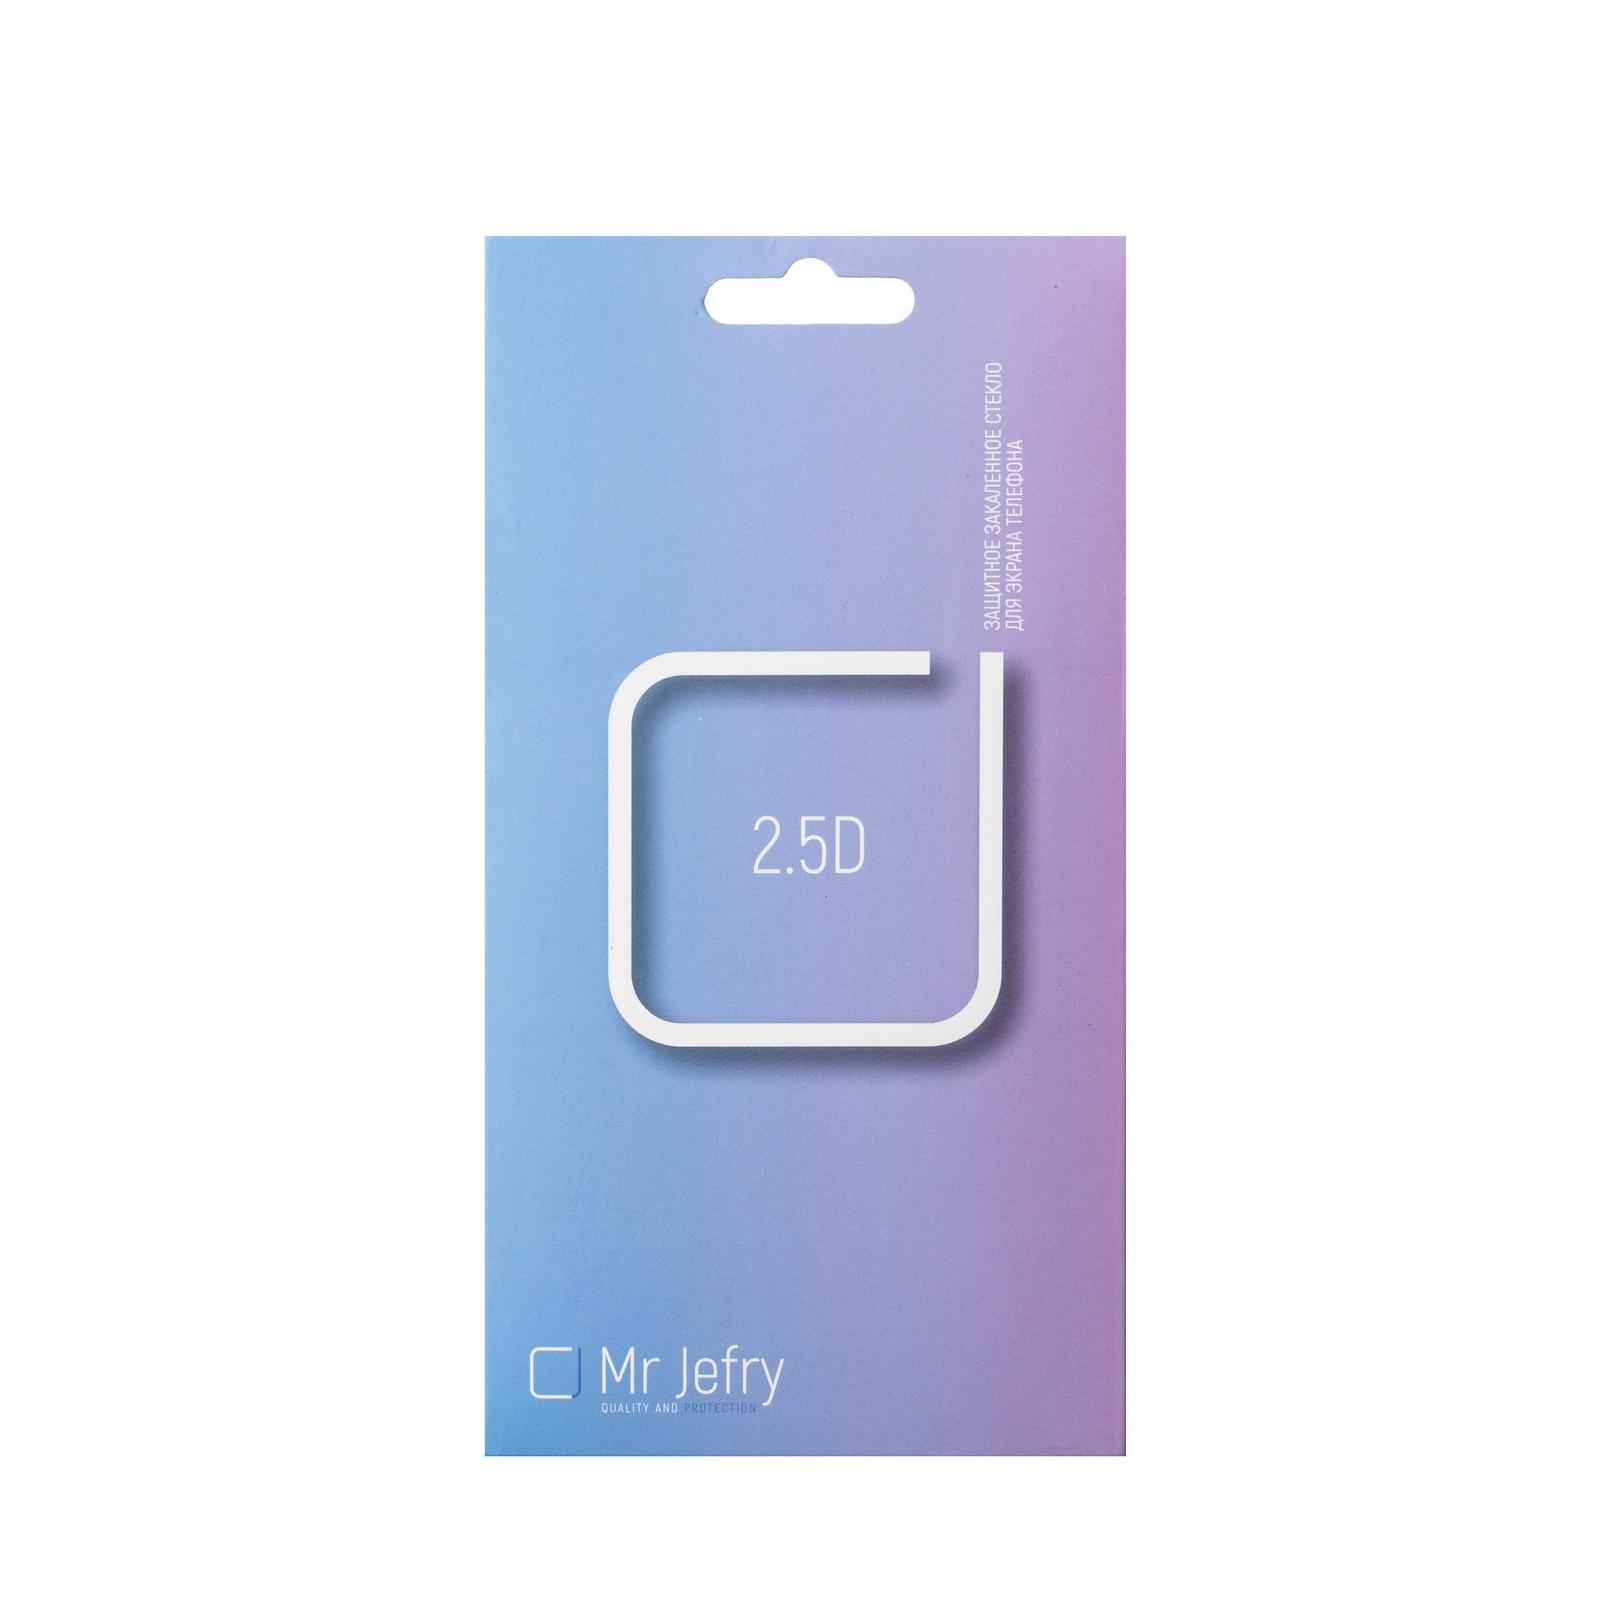 Mr Jefry стекло защитное (многослойное) 2,5D для IPhone x/xs